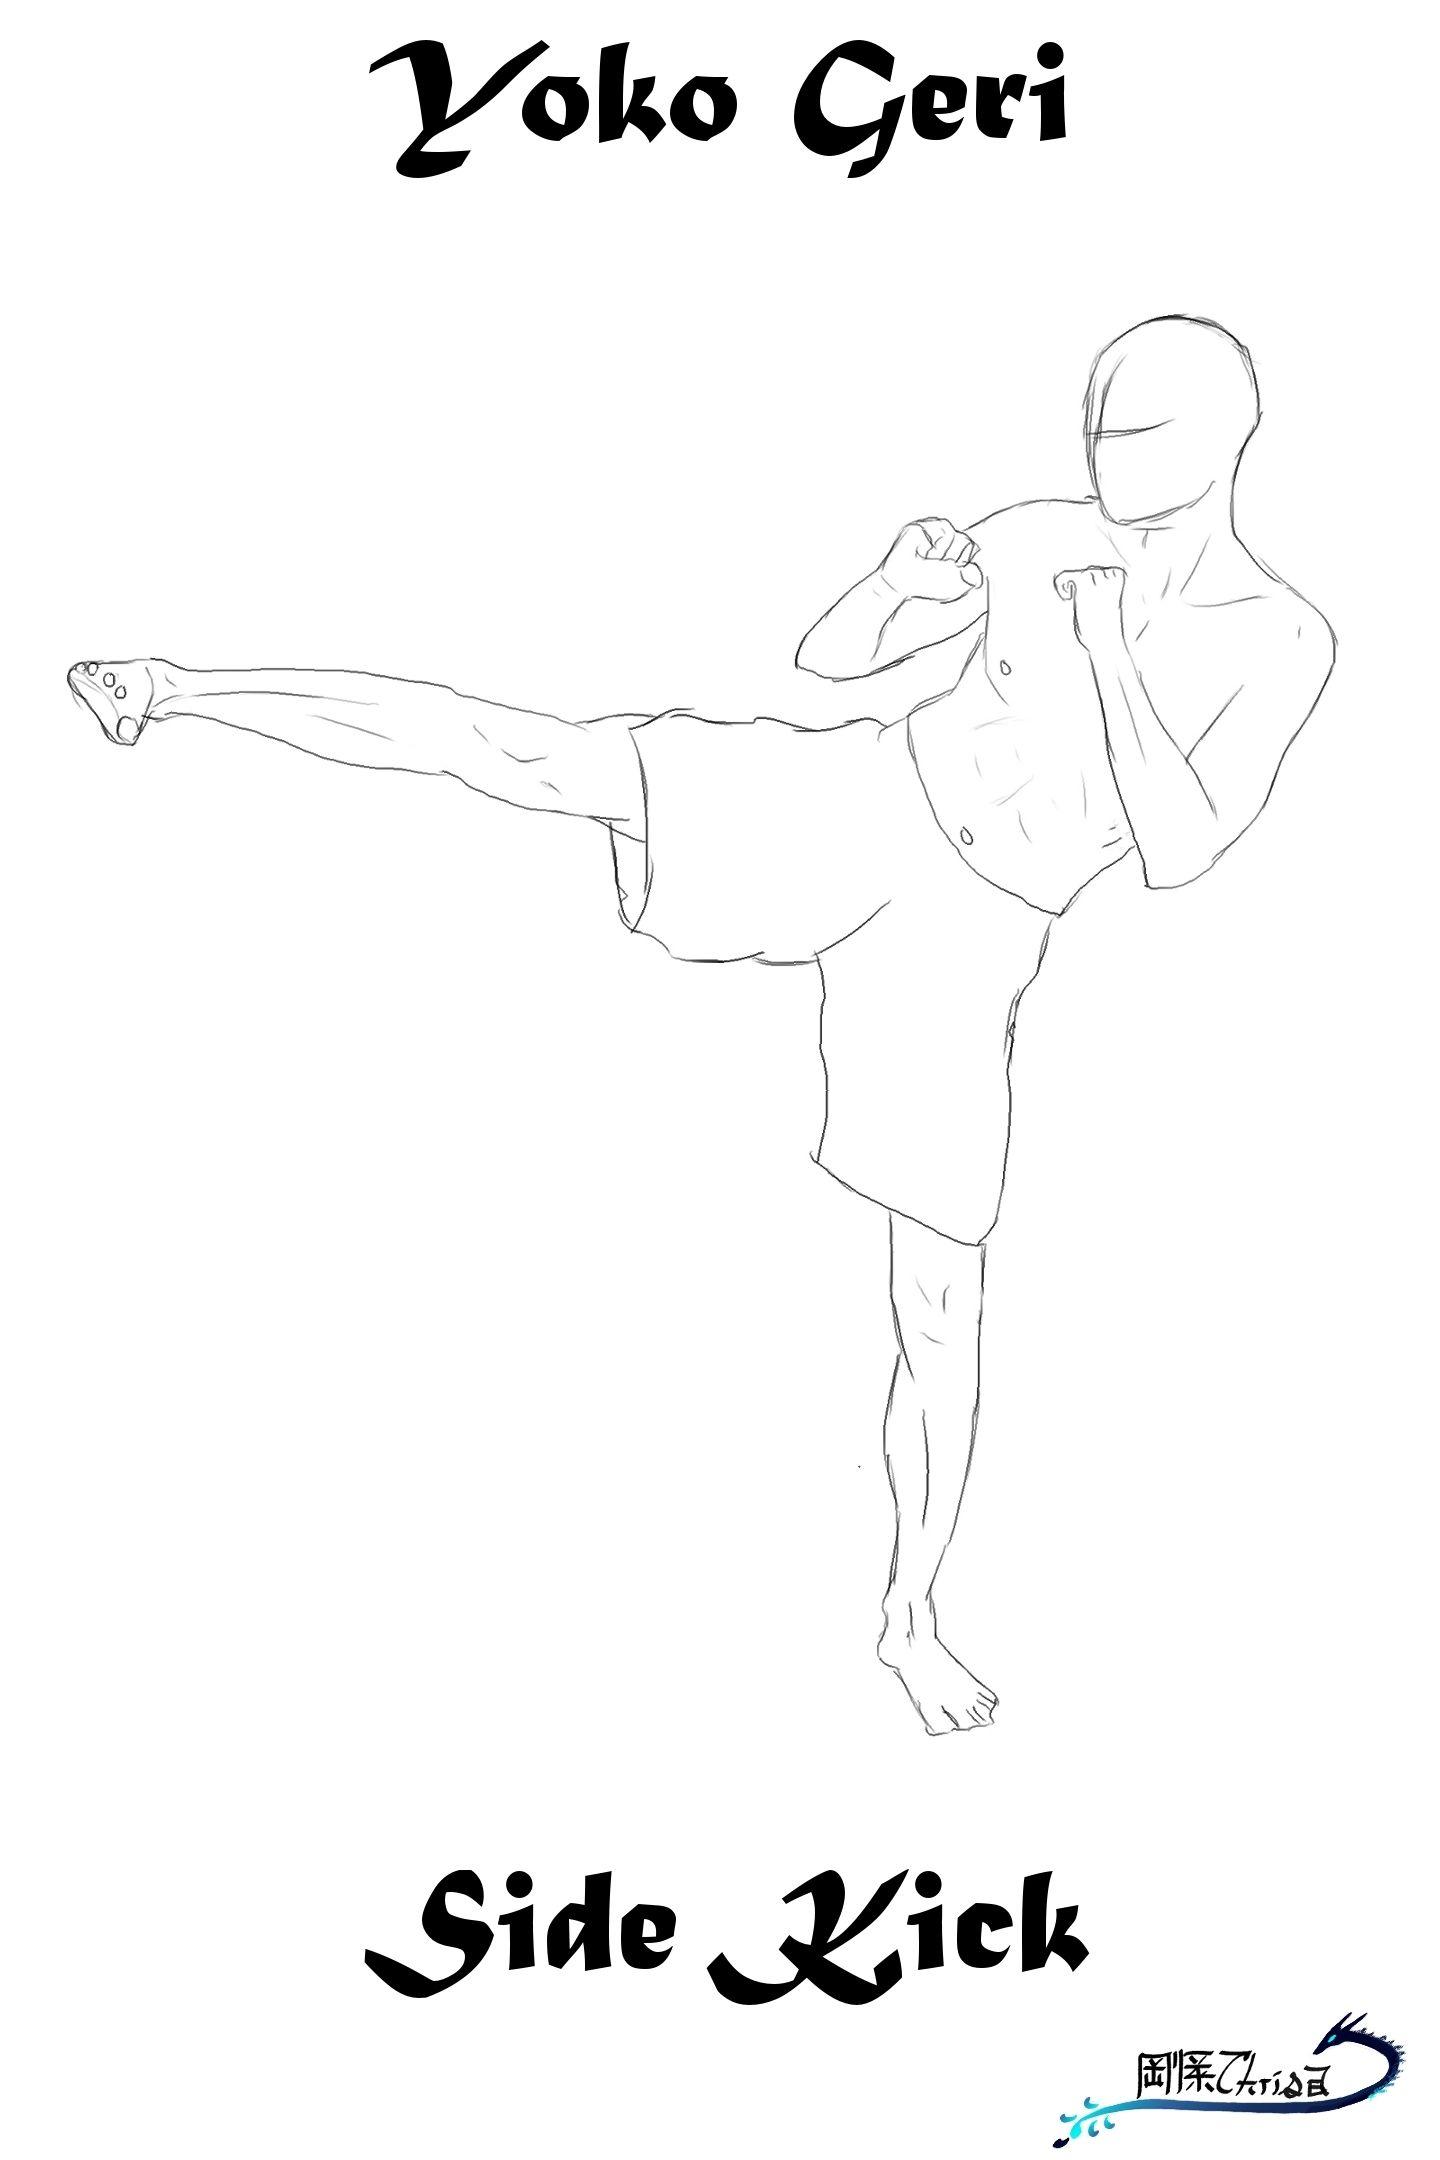 stickman taekwondo cindi boyes douglas haha taekwondo karate side kick